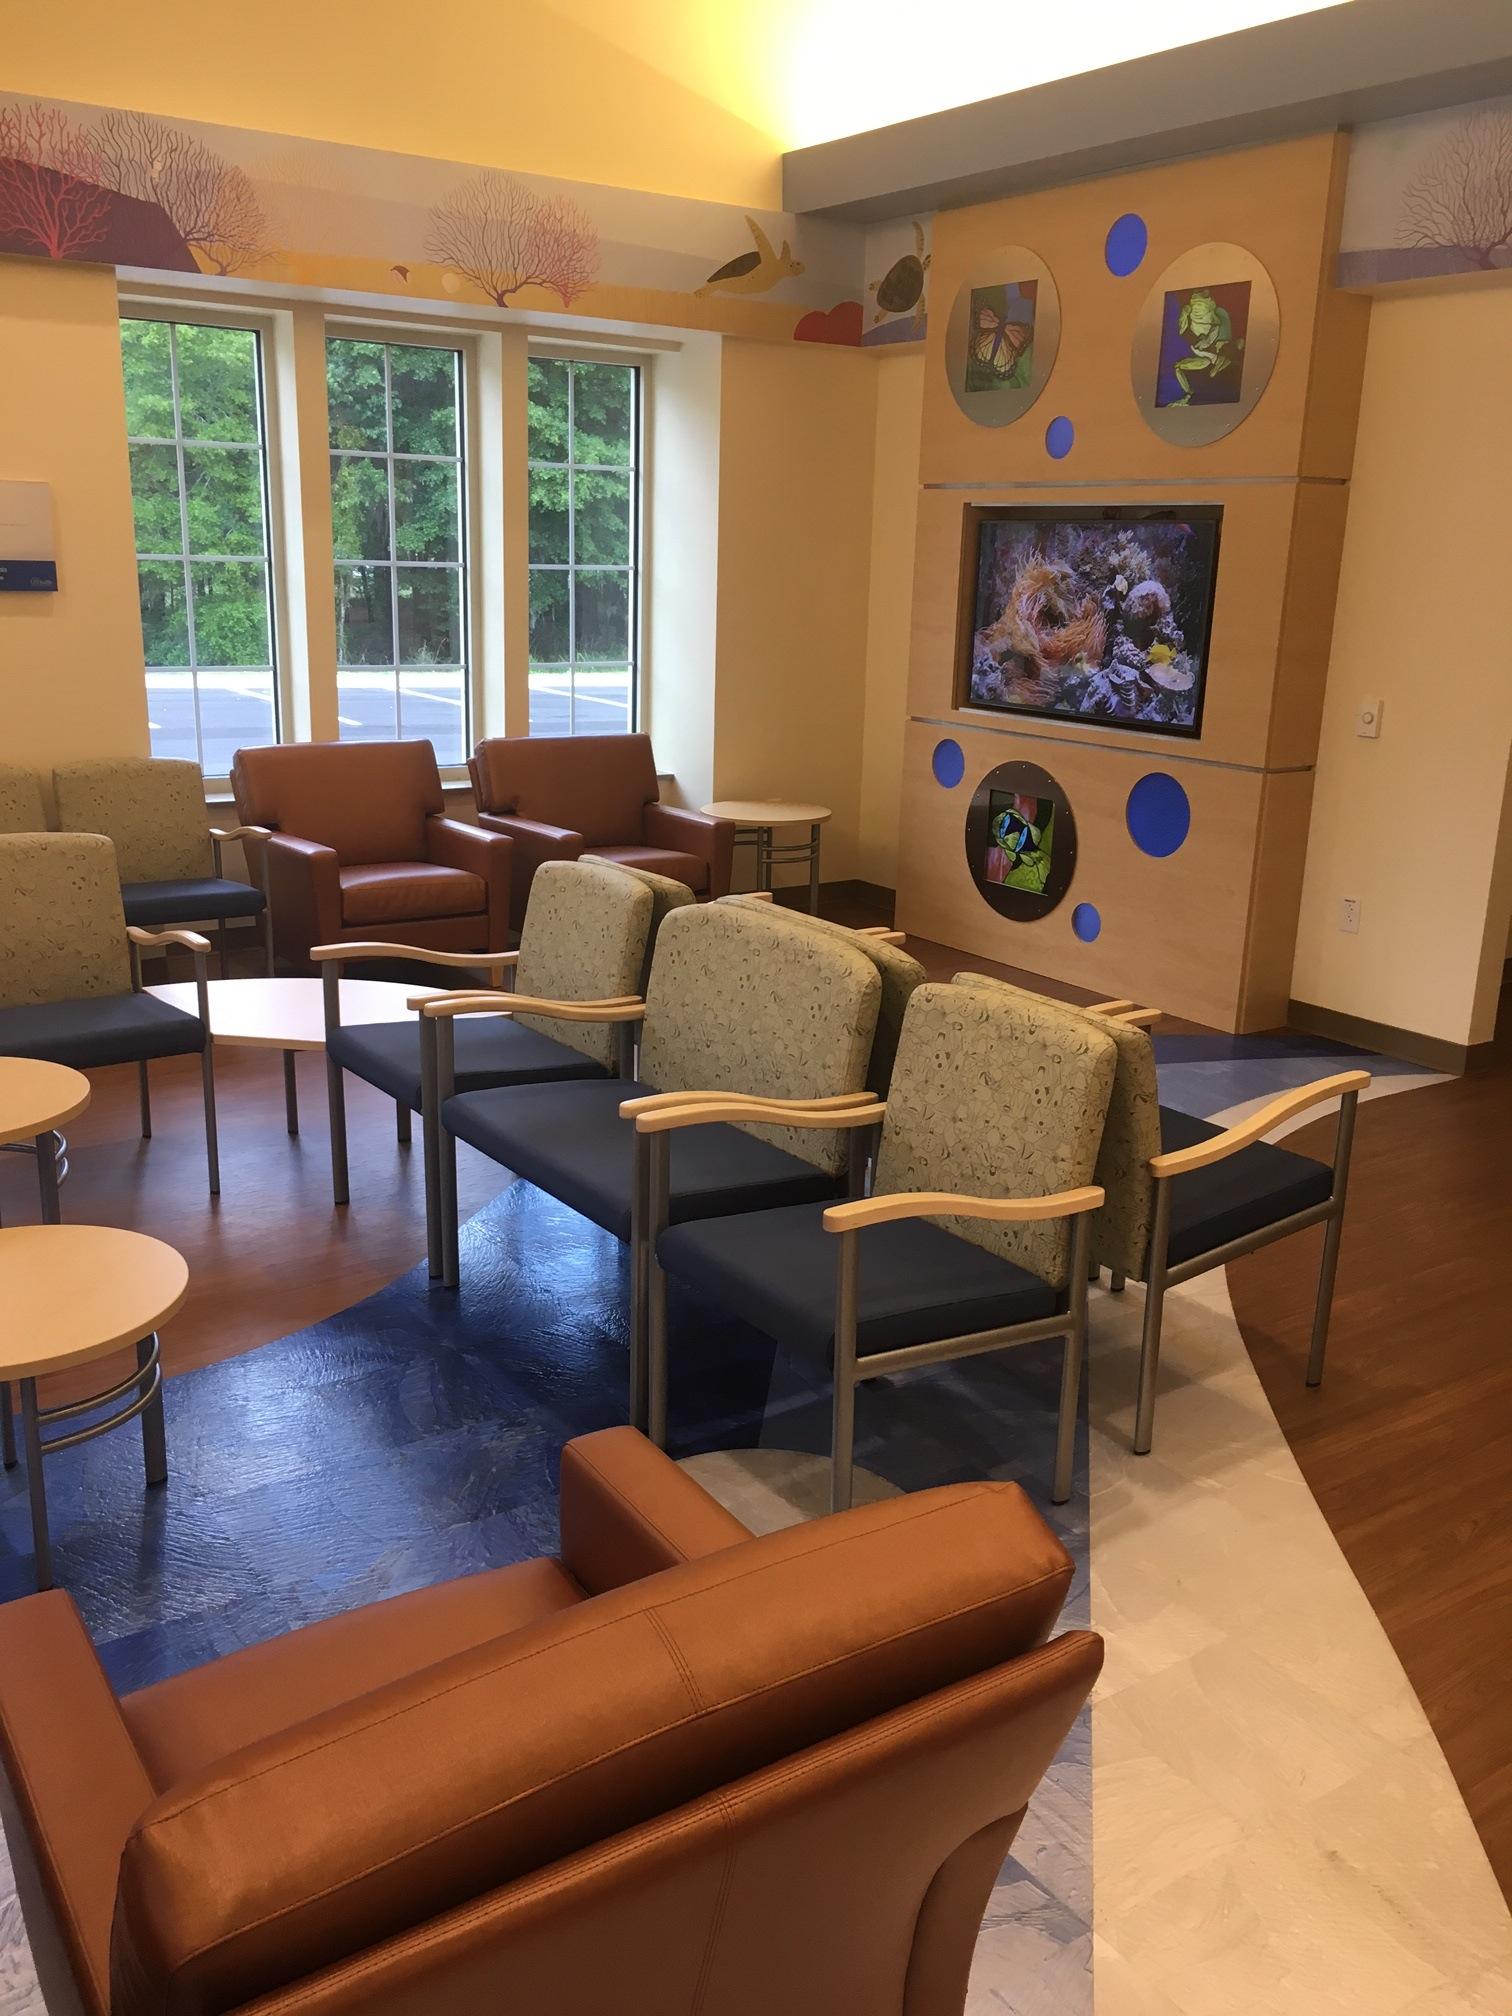 Hospital Procedure Room: UF Health Children's Surgical Center